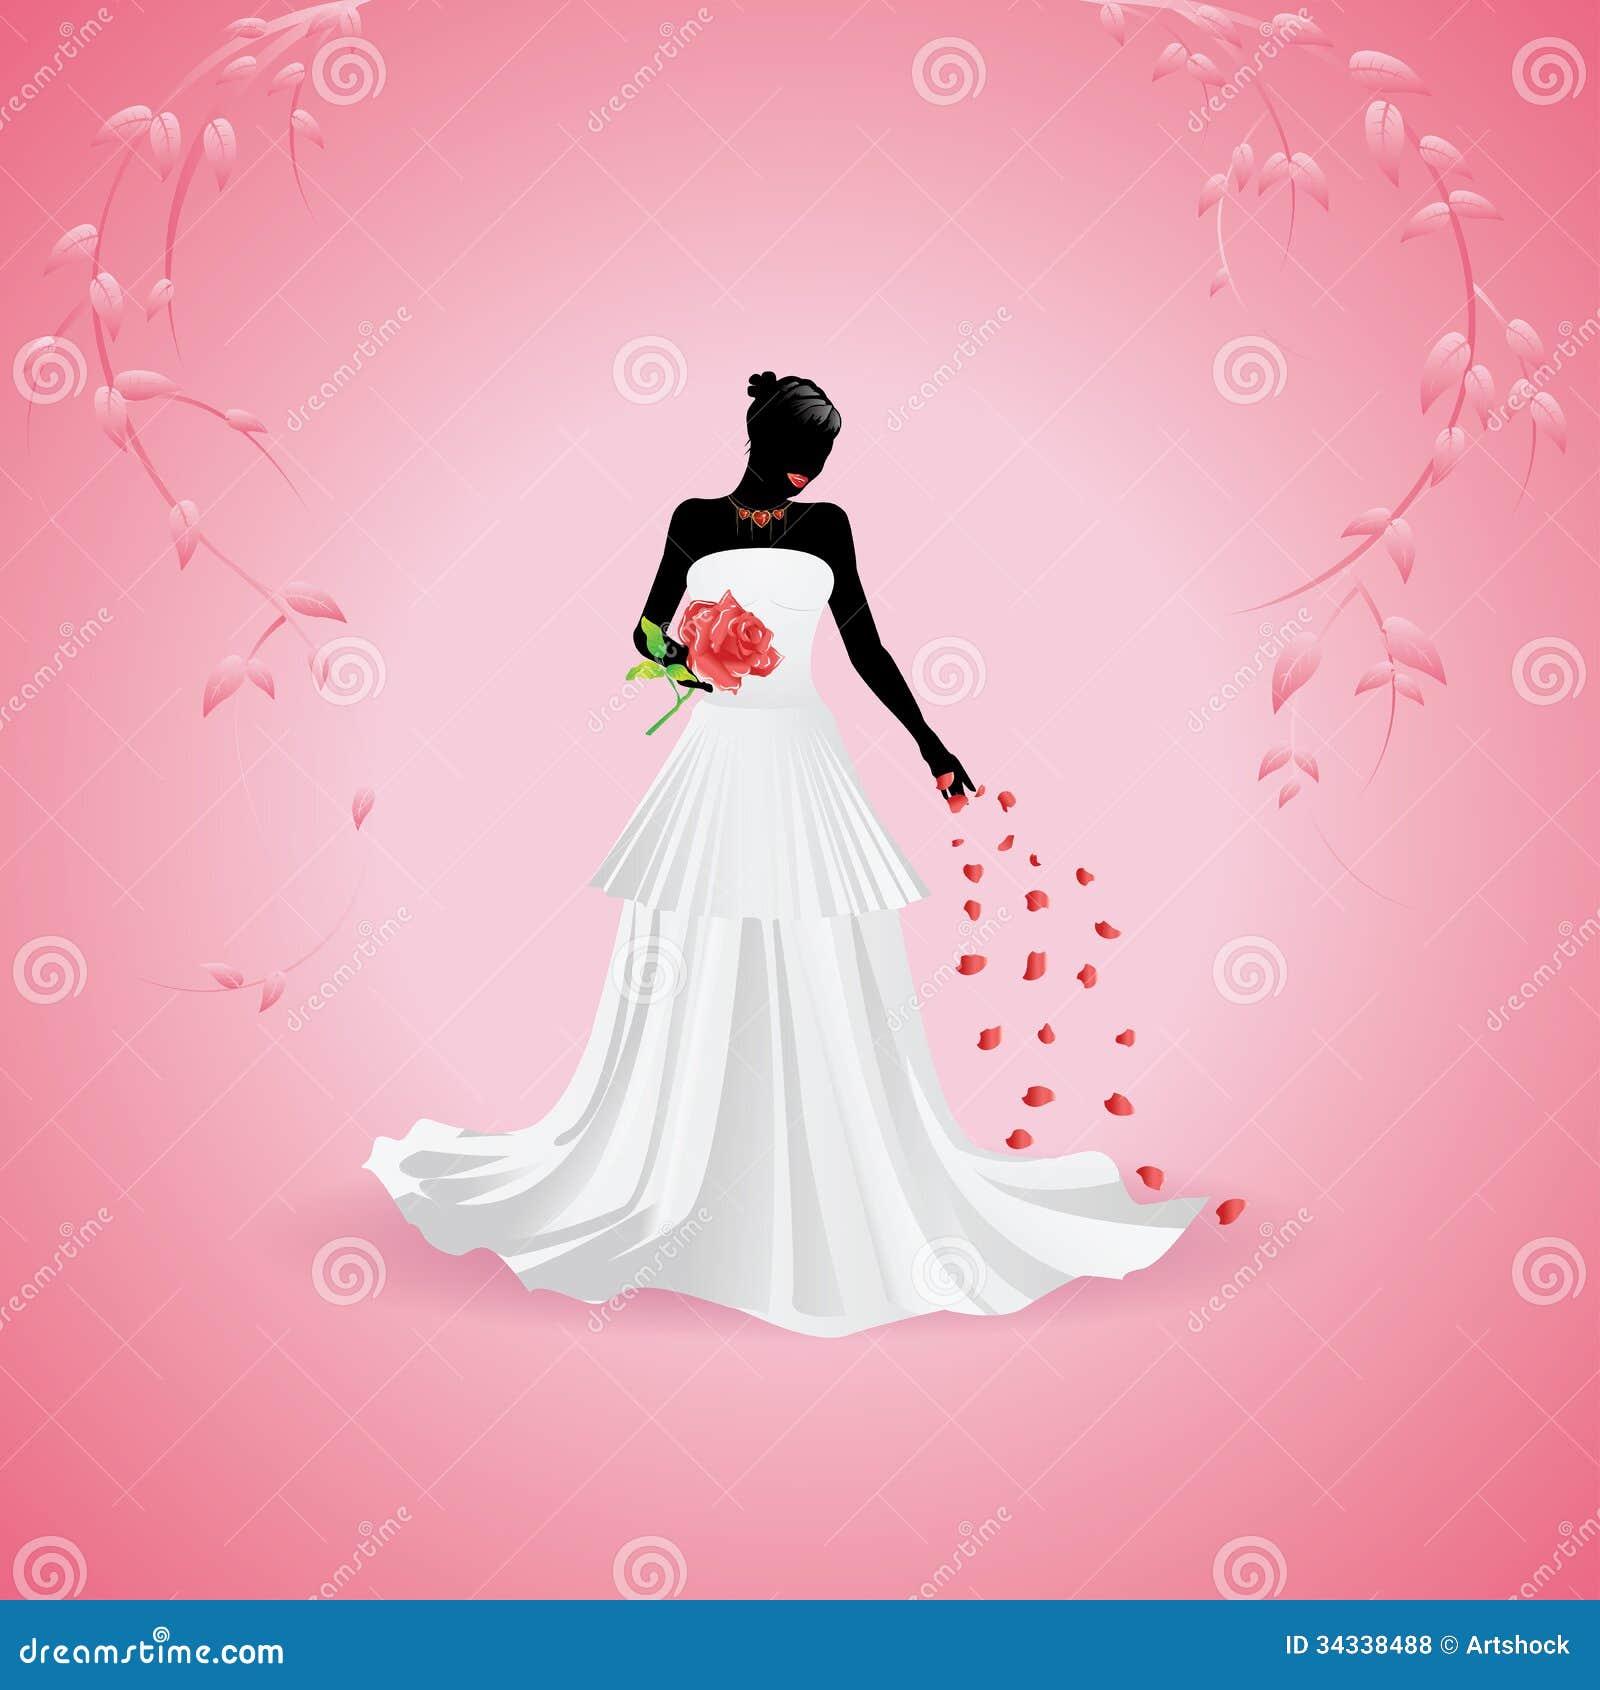 Bride Silhouette Royalty Free Stock Photos - Image: 34338488